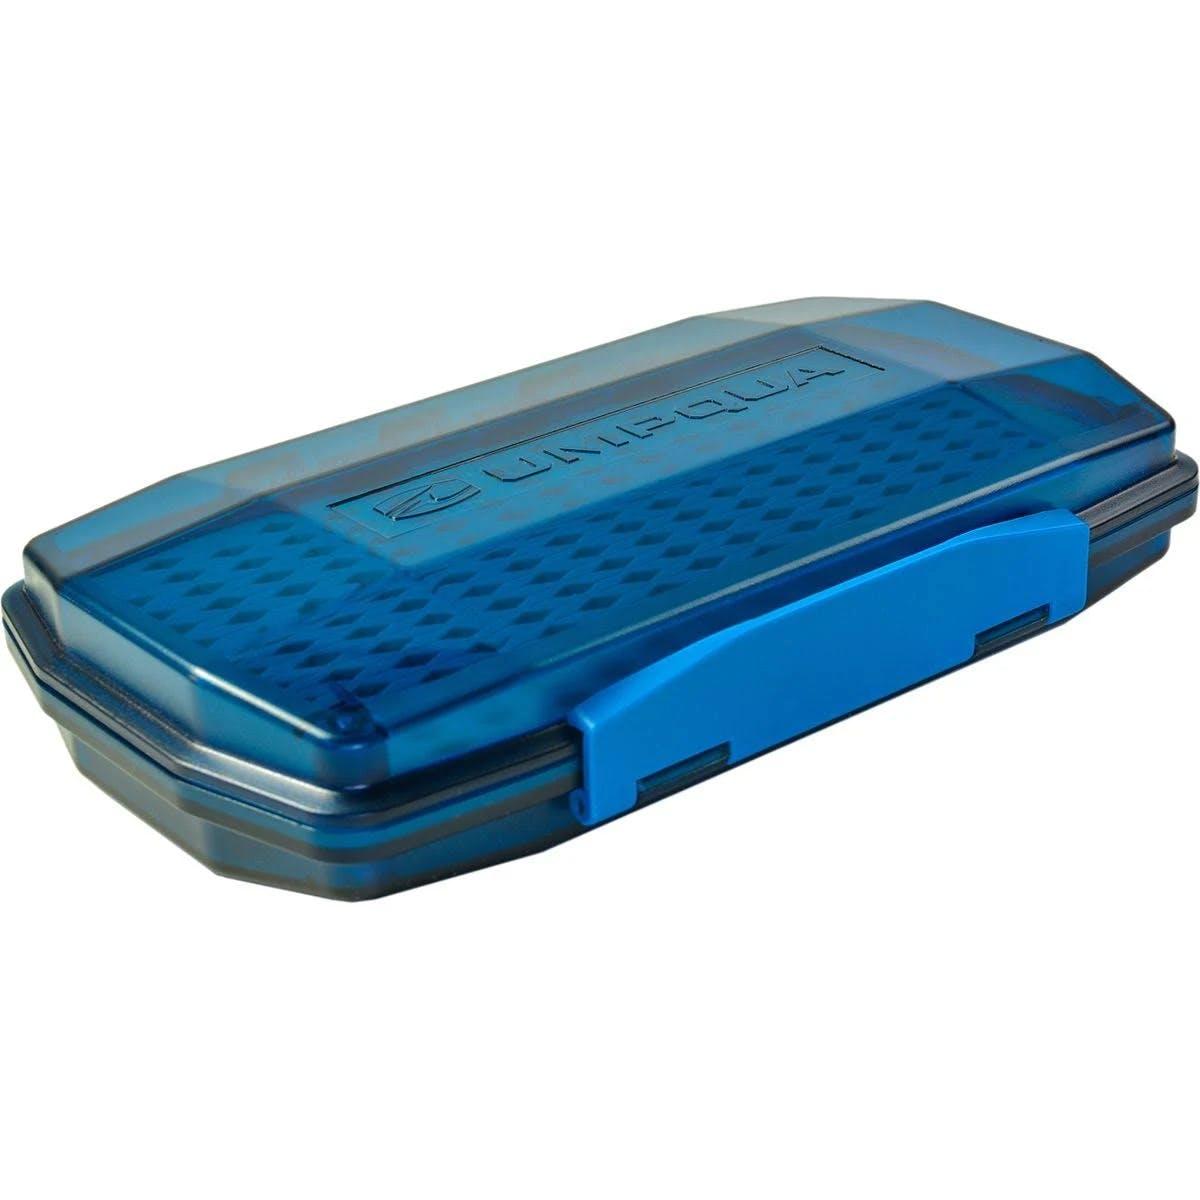 Umpqua UPG HD Fly Box Large, Blue